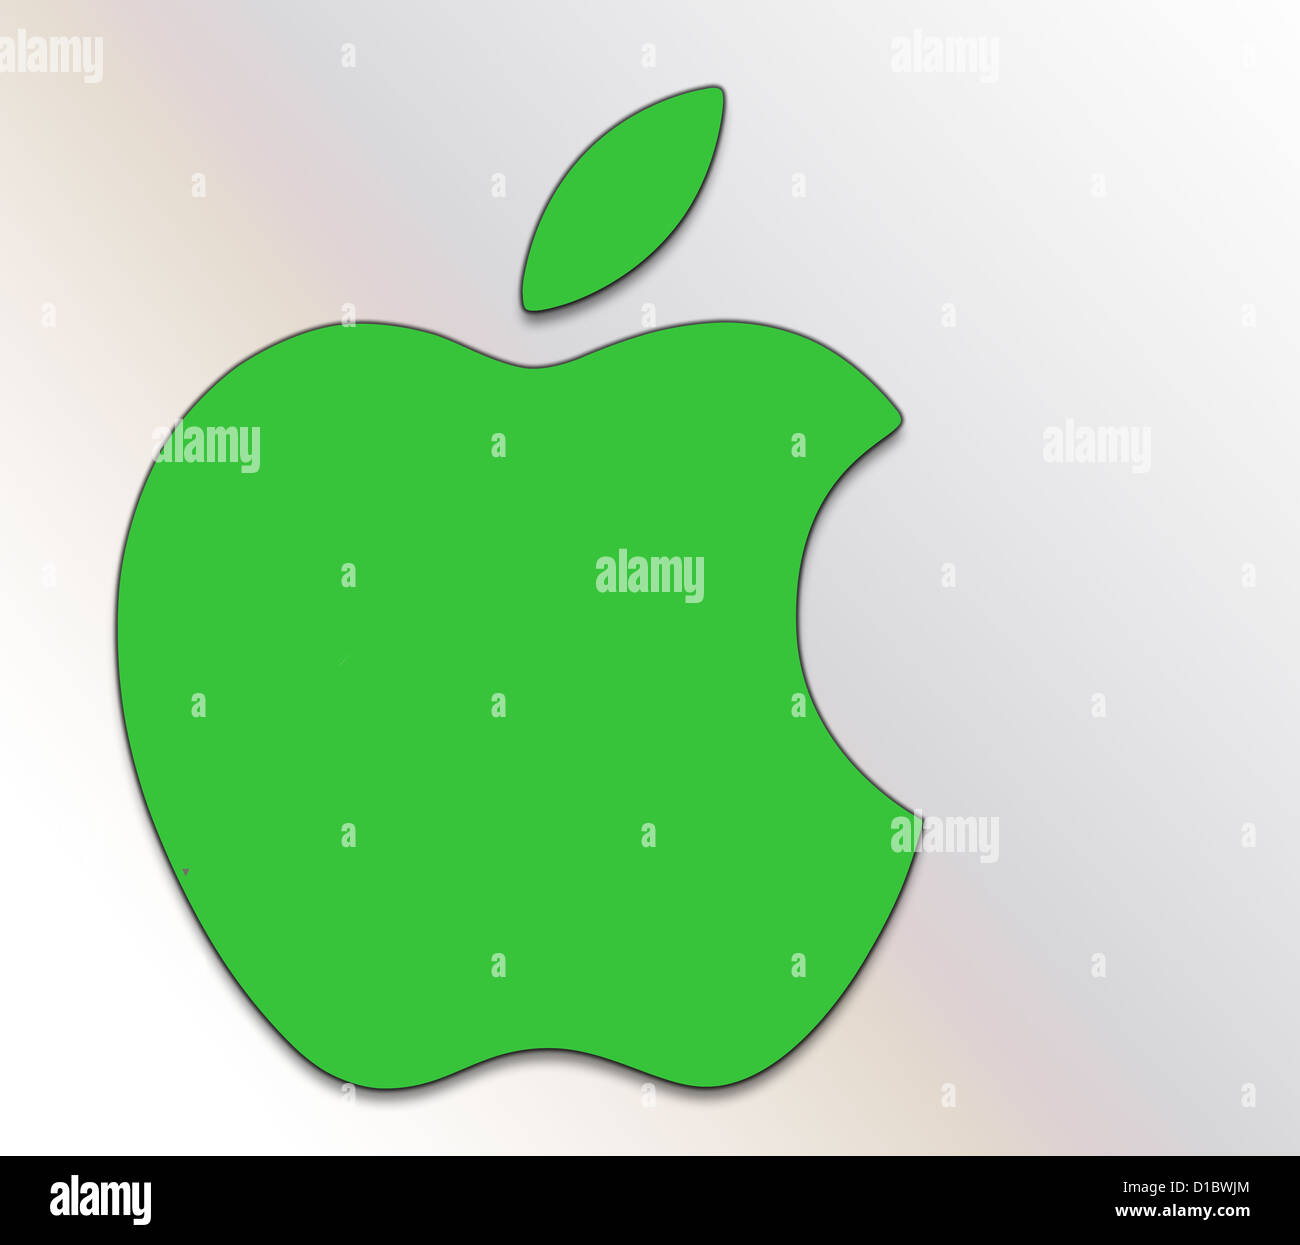 apple logo stock photos & apple logo stock images - alamy